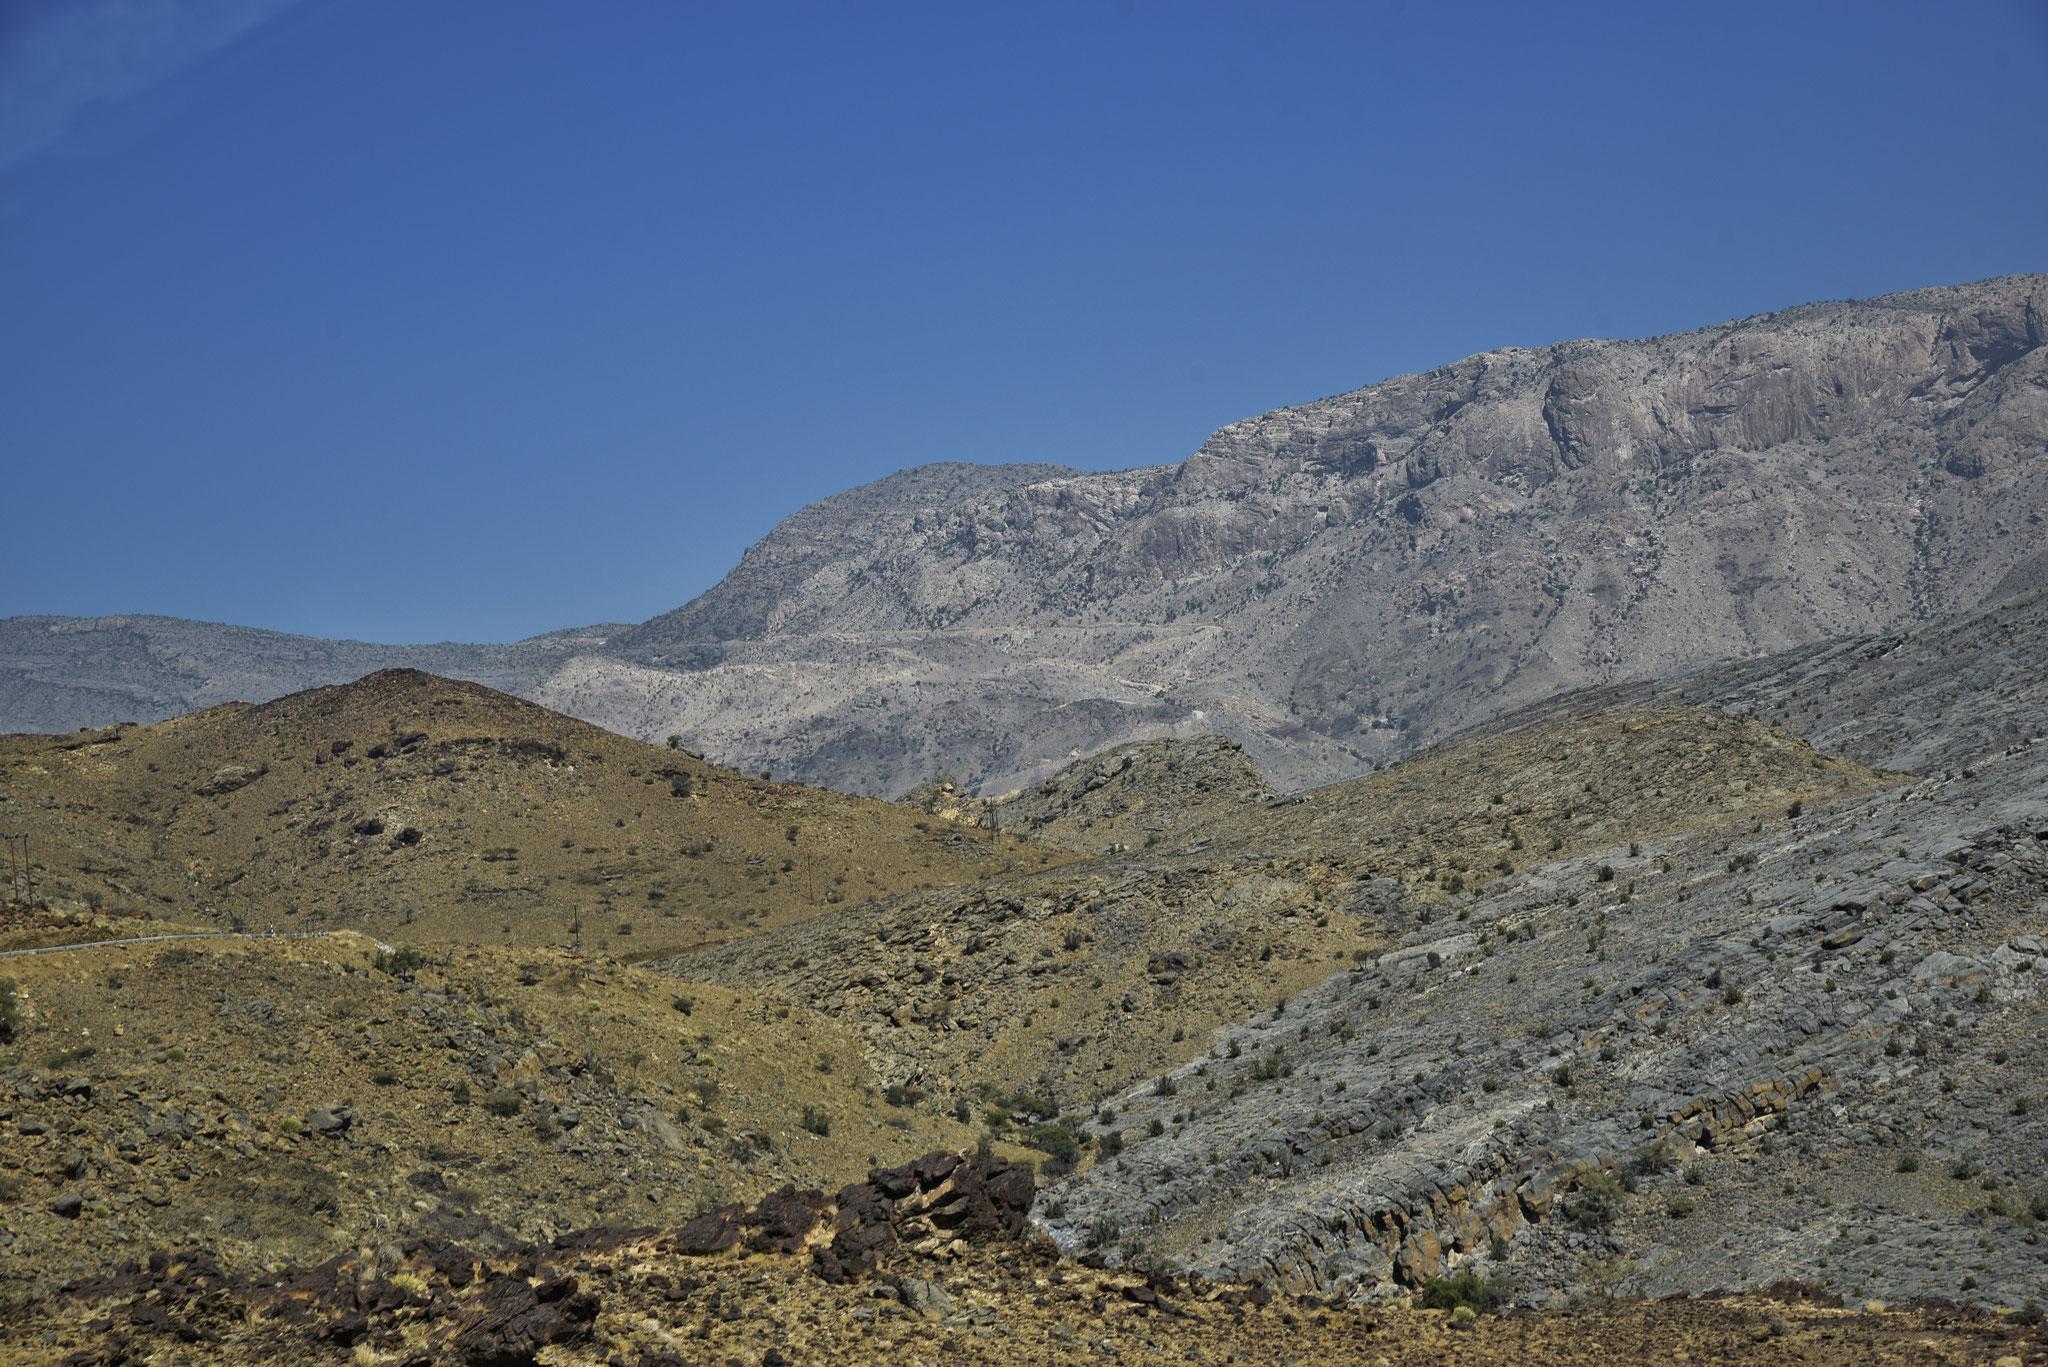 Auf dem Weg zum Jebel Shams VIII